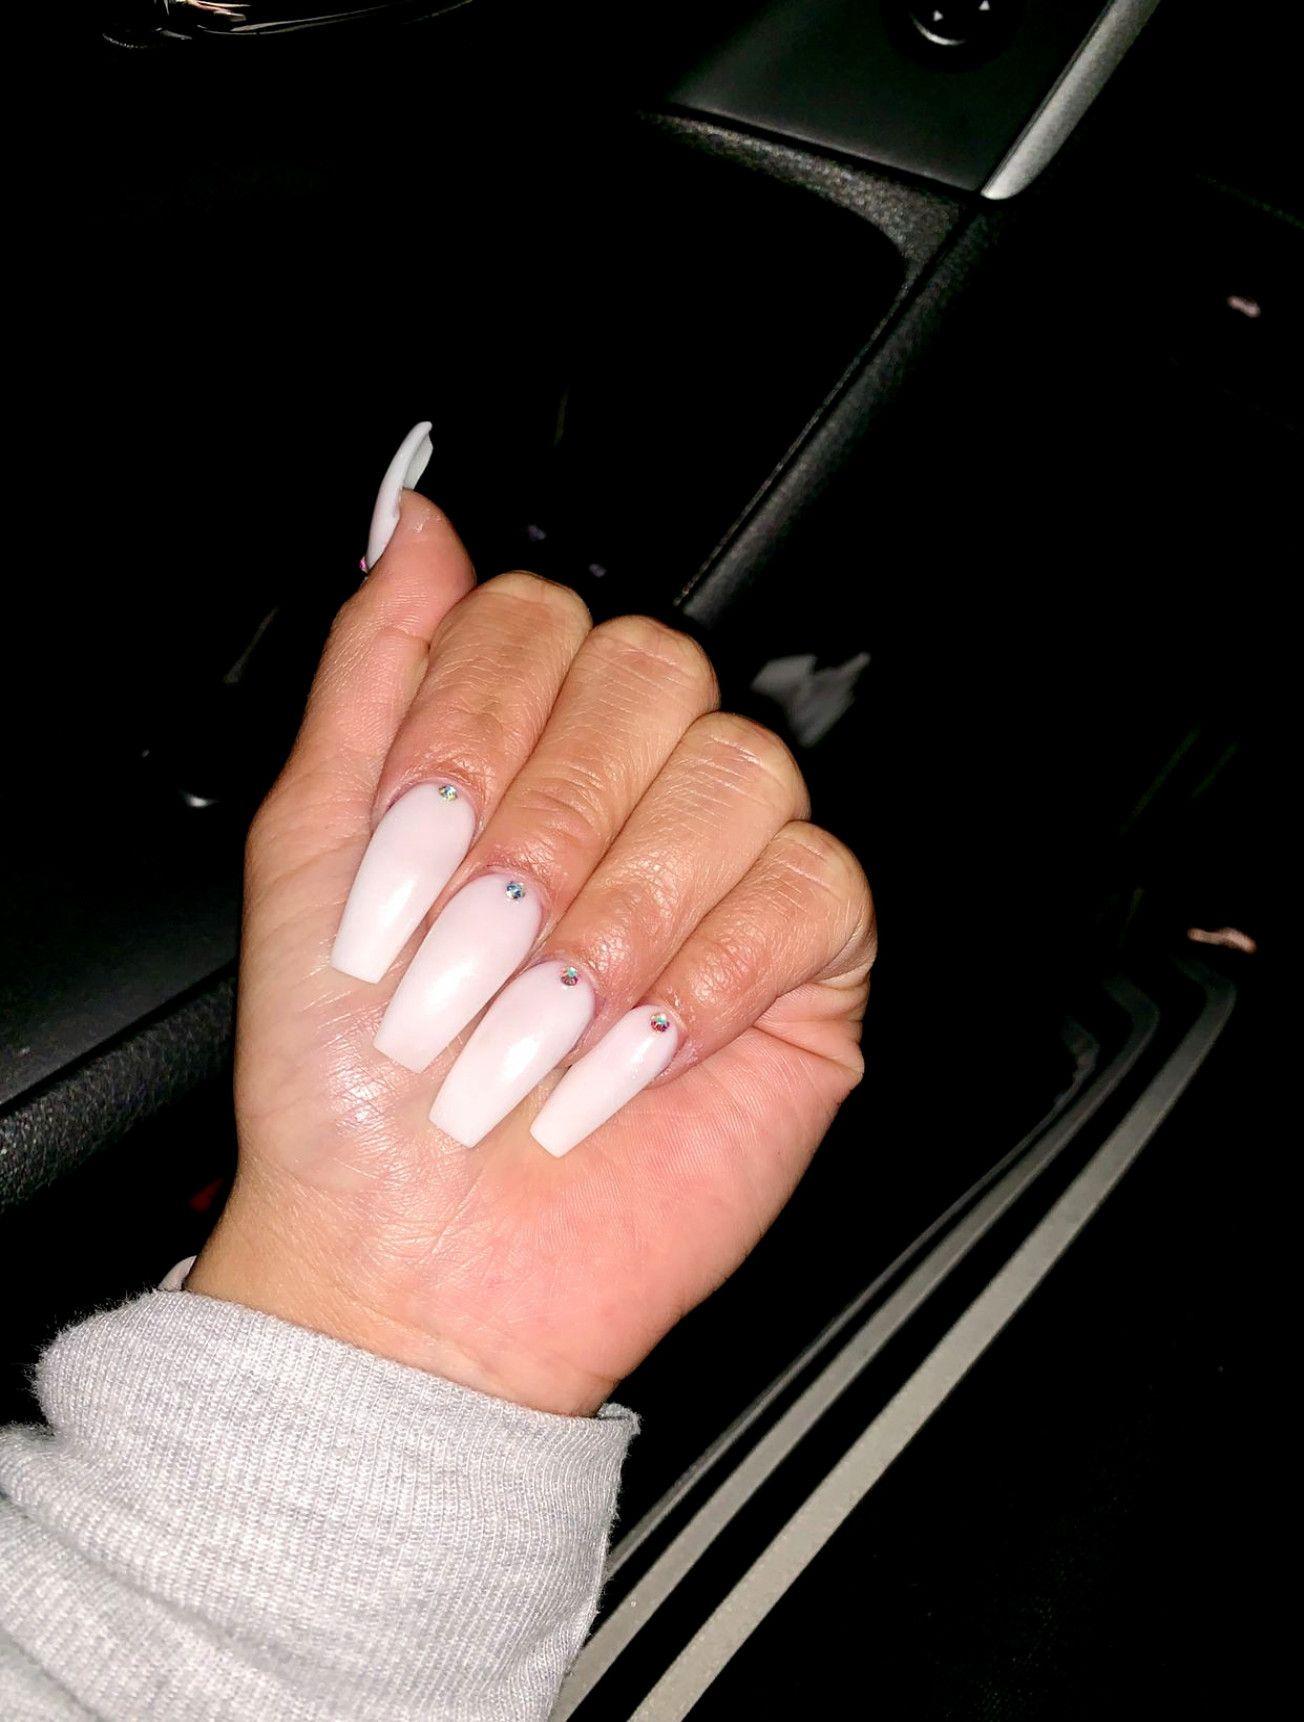 white opal\u201d acrylic powder w/ one diamond on each finger